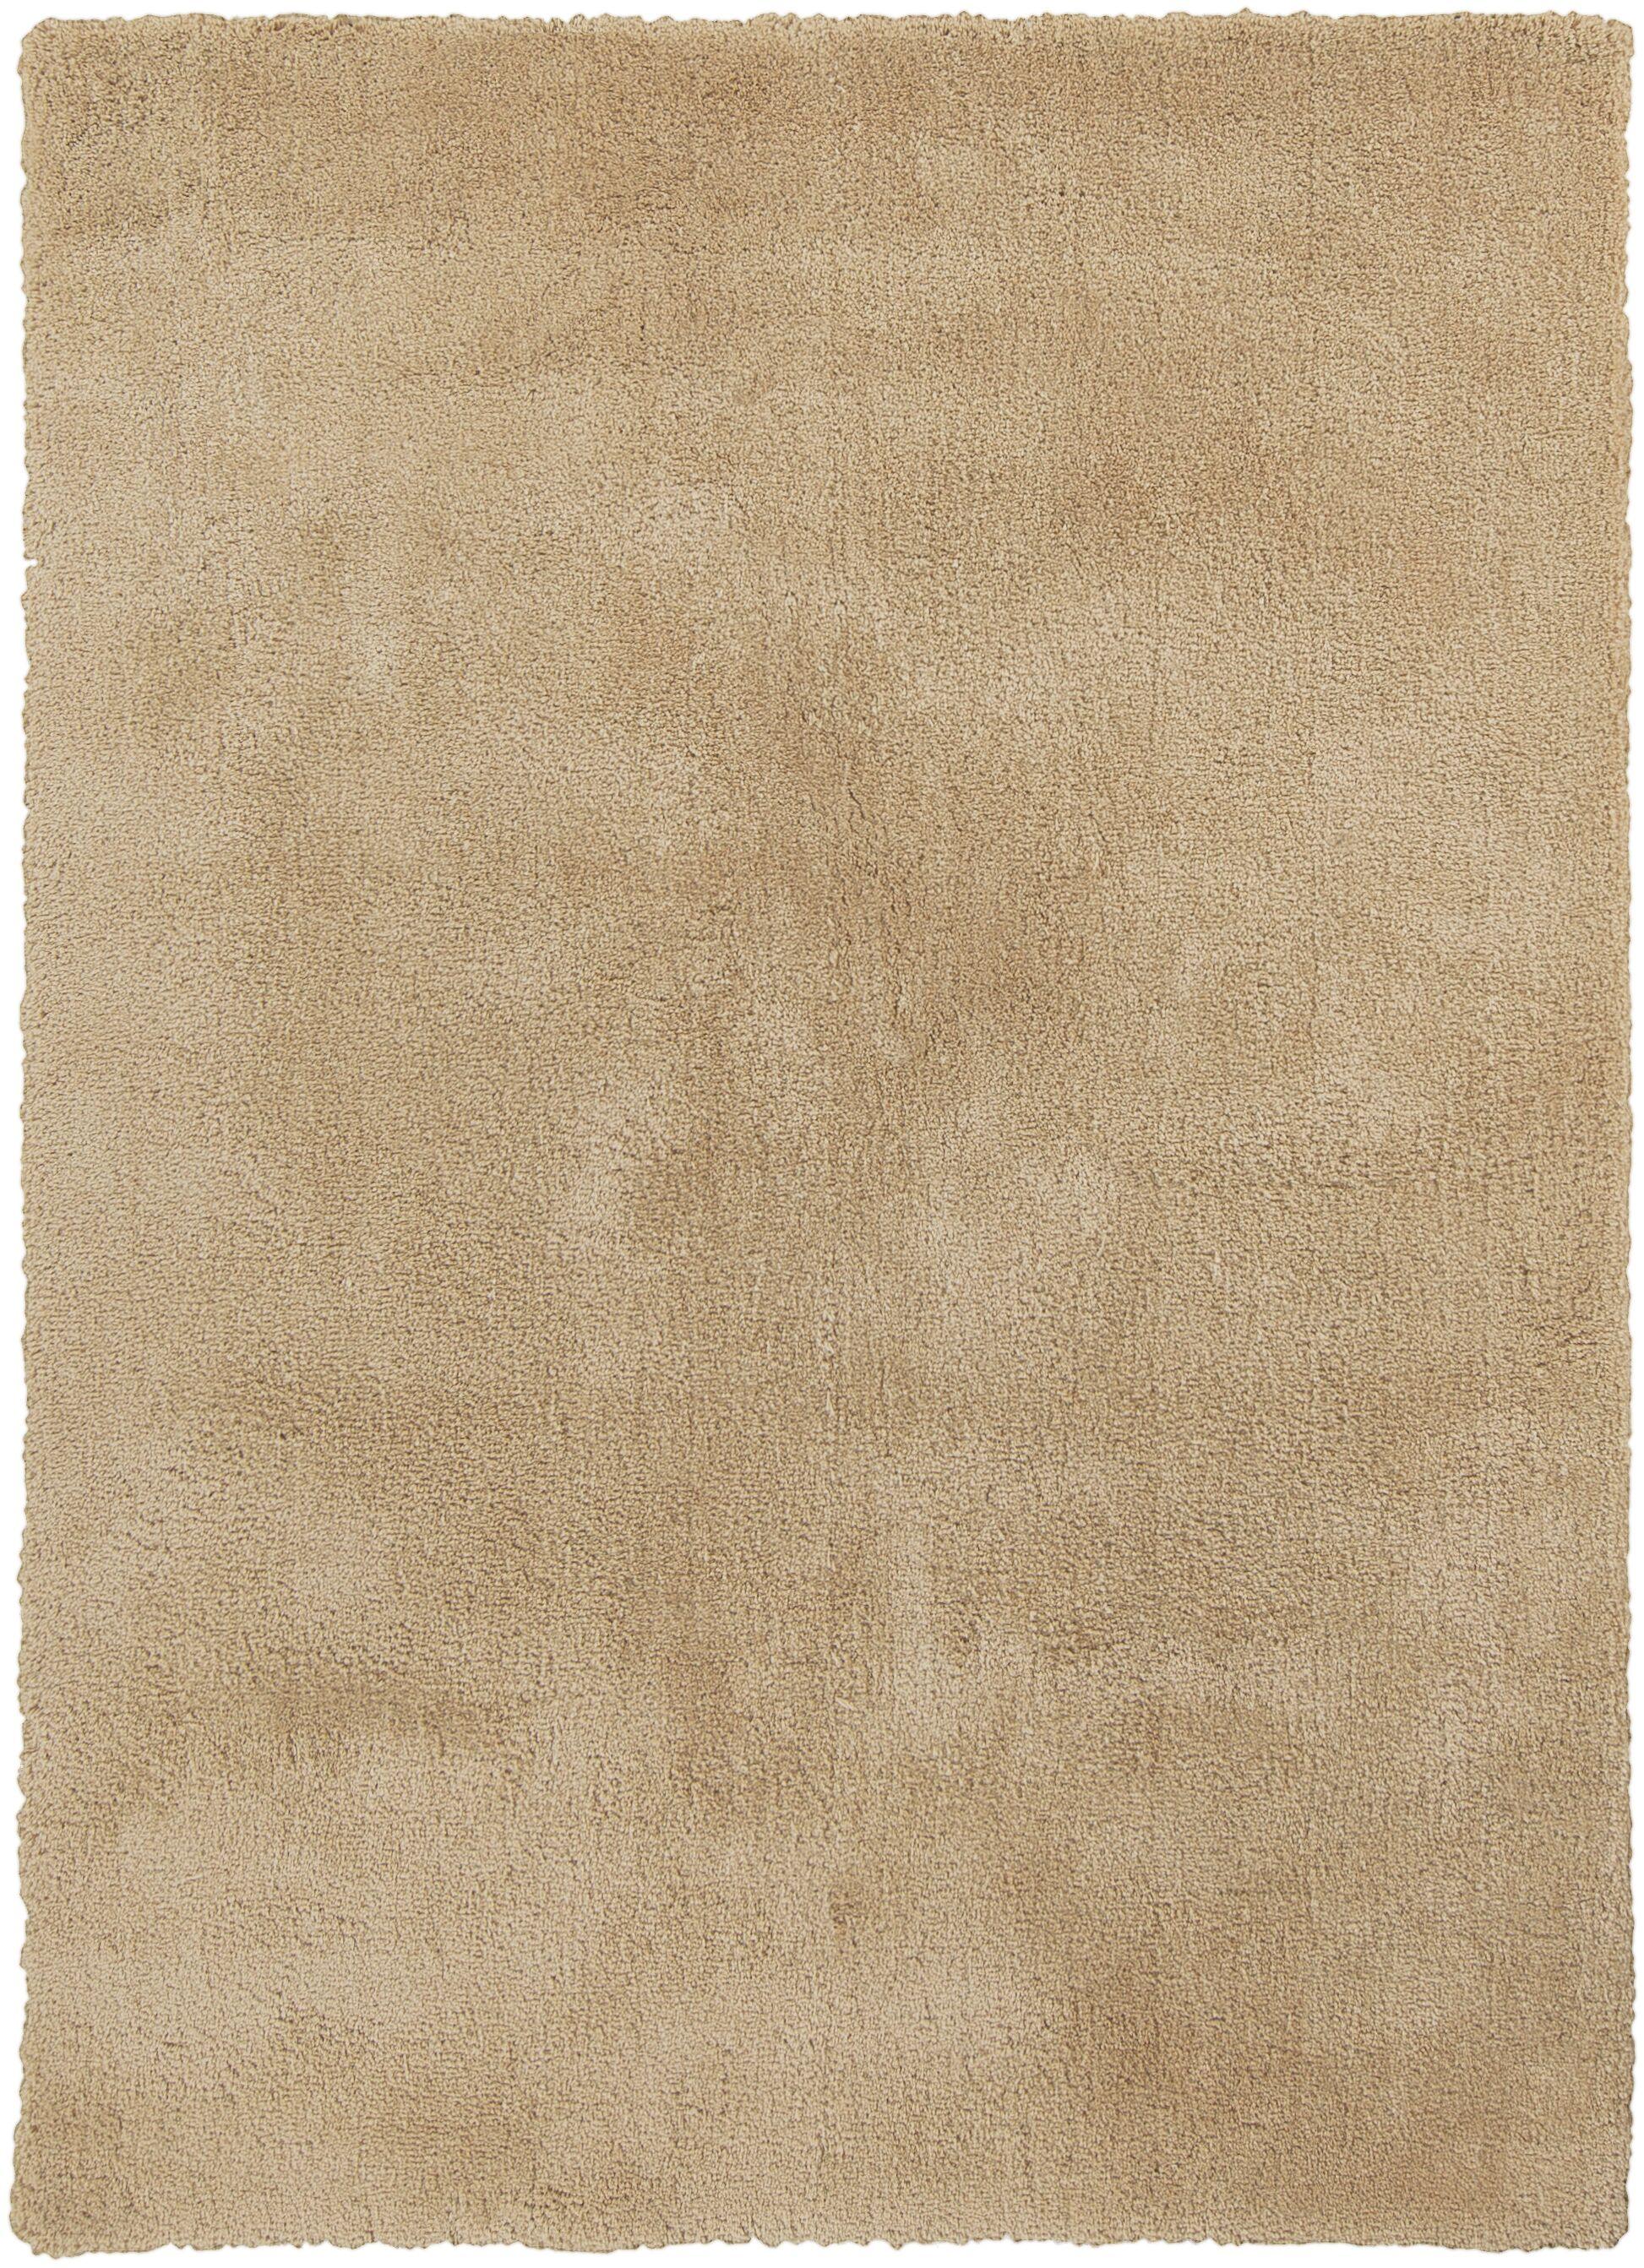 Braun Blond Area Rug Rug Size: Rectangle 8' x 11'